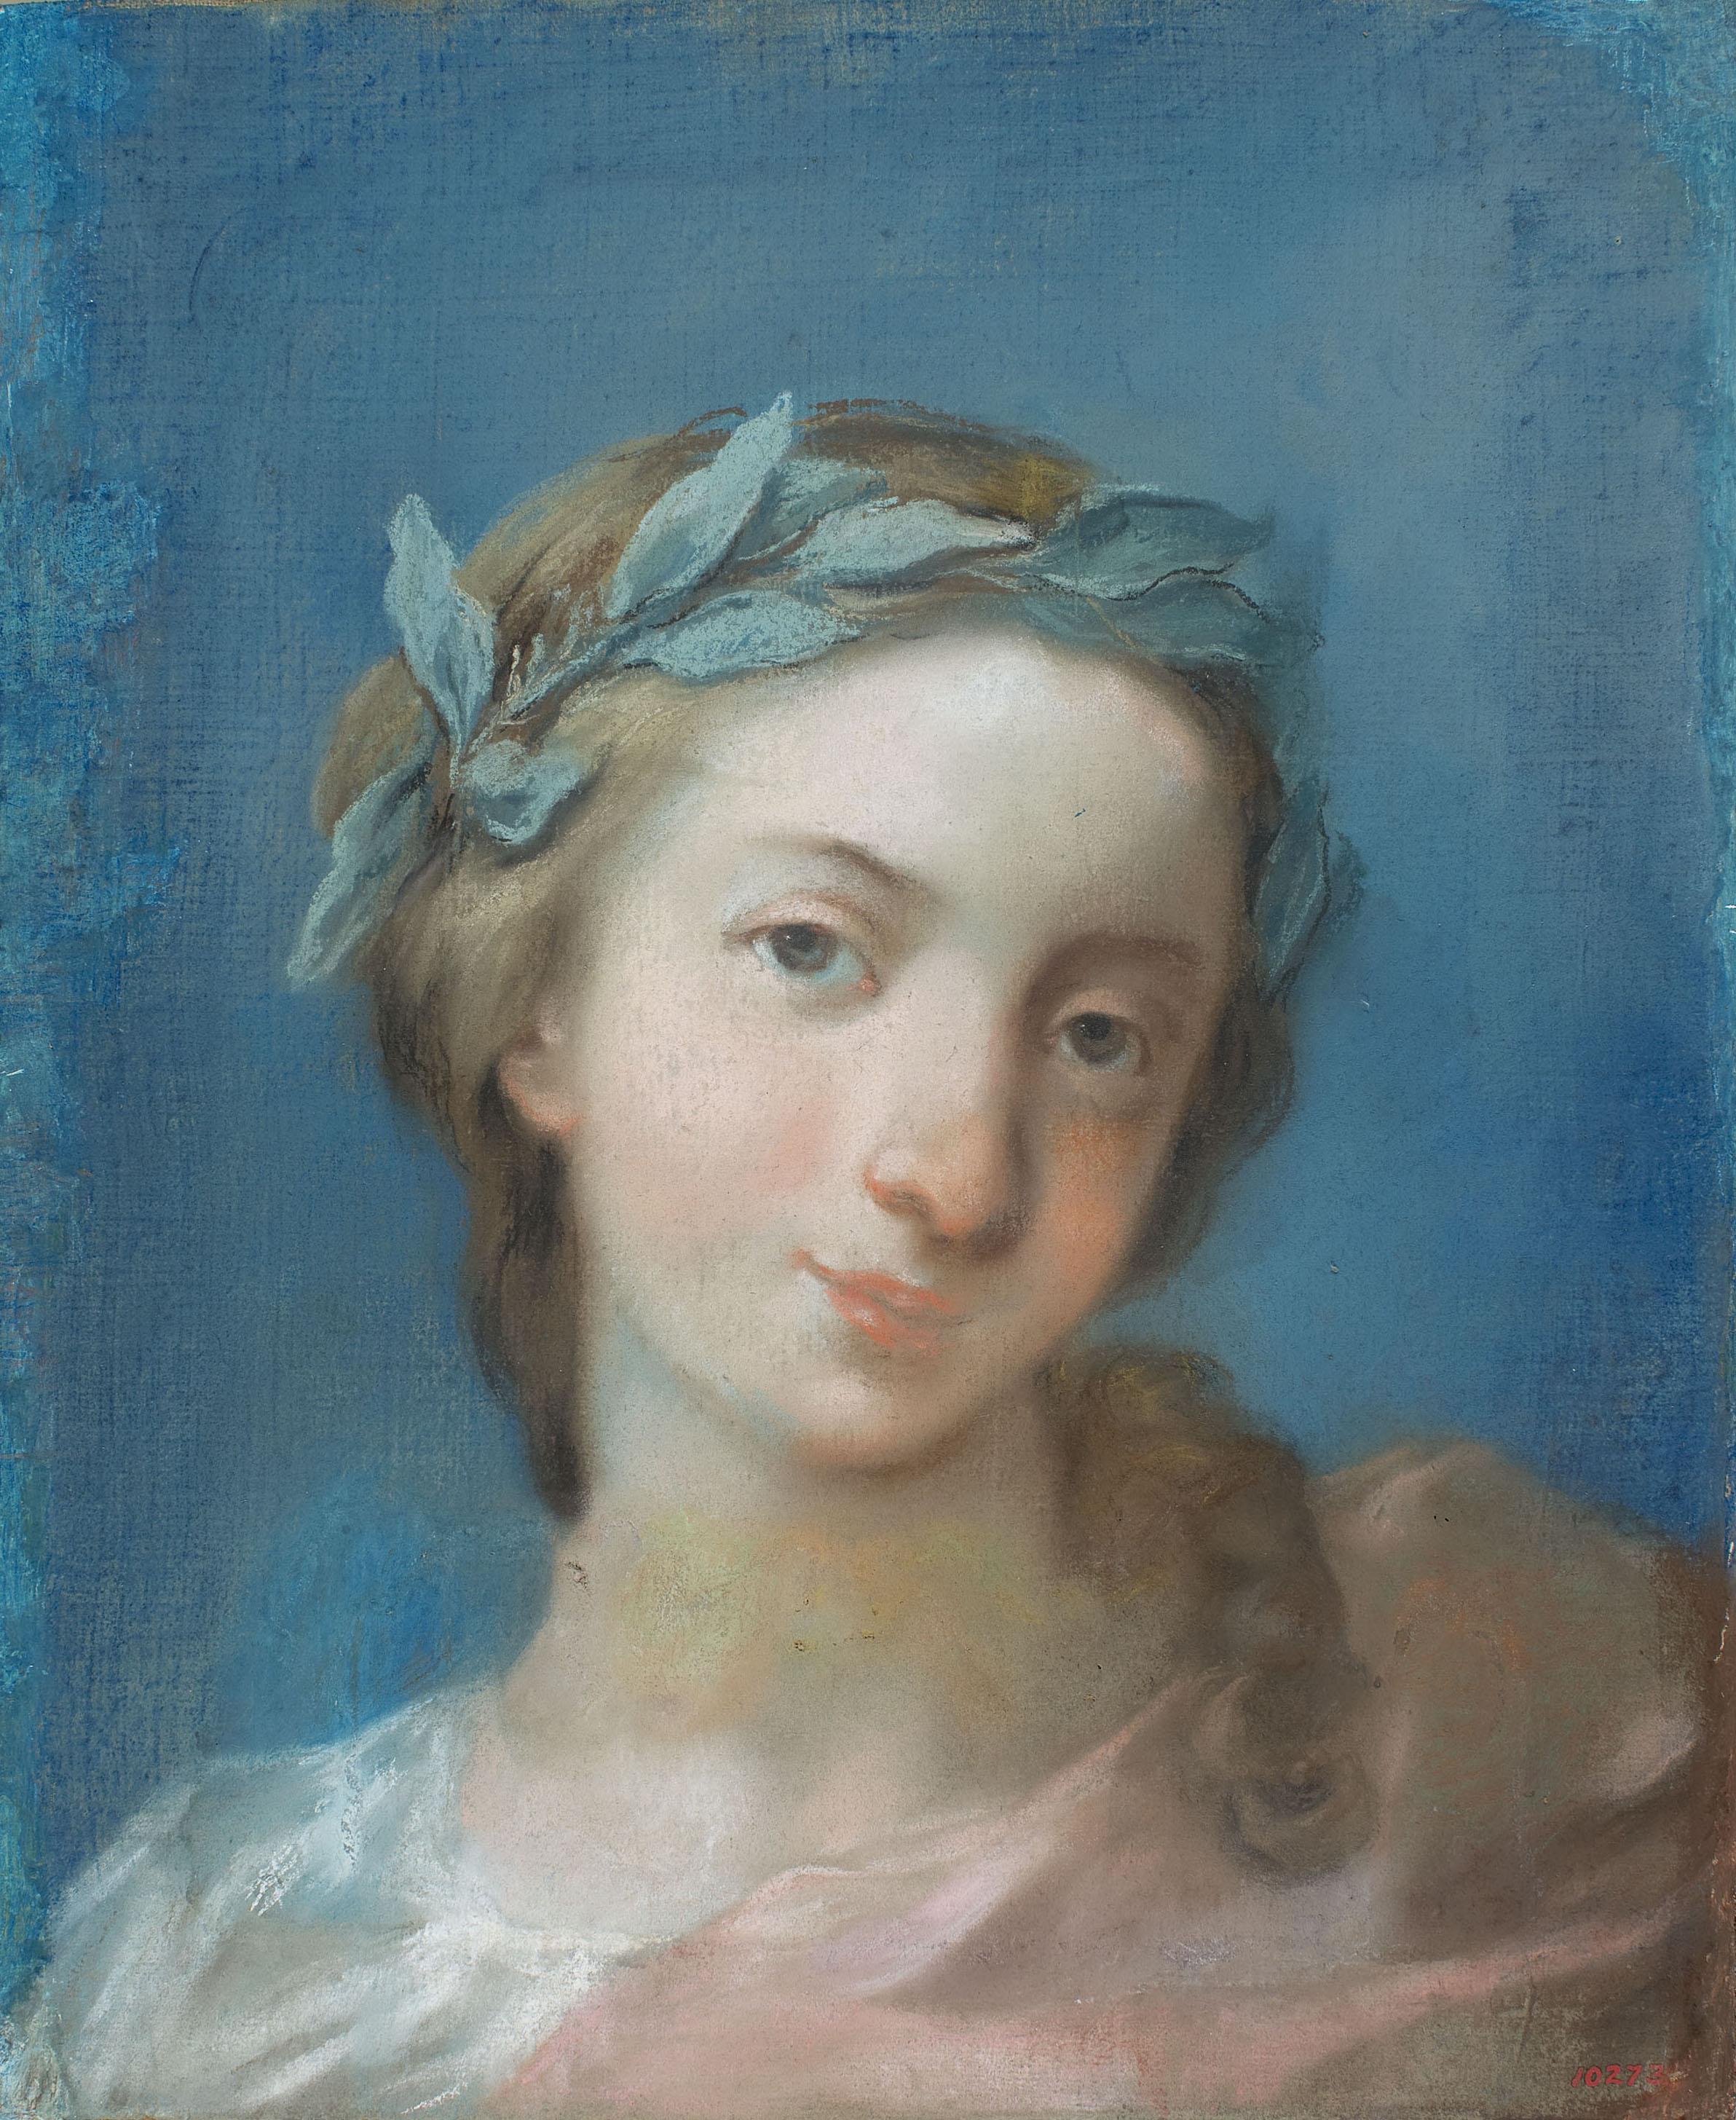 Josep Bernat Flaugier - Study of a female bust - Circa 1800-1812